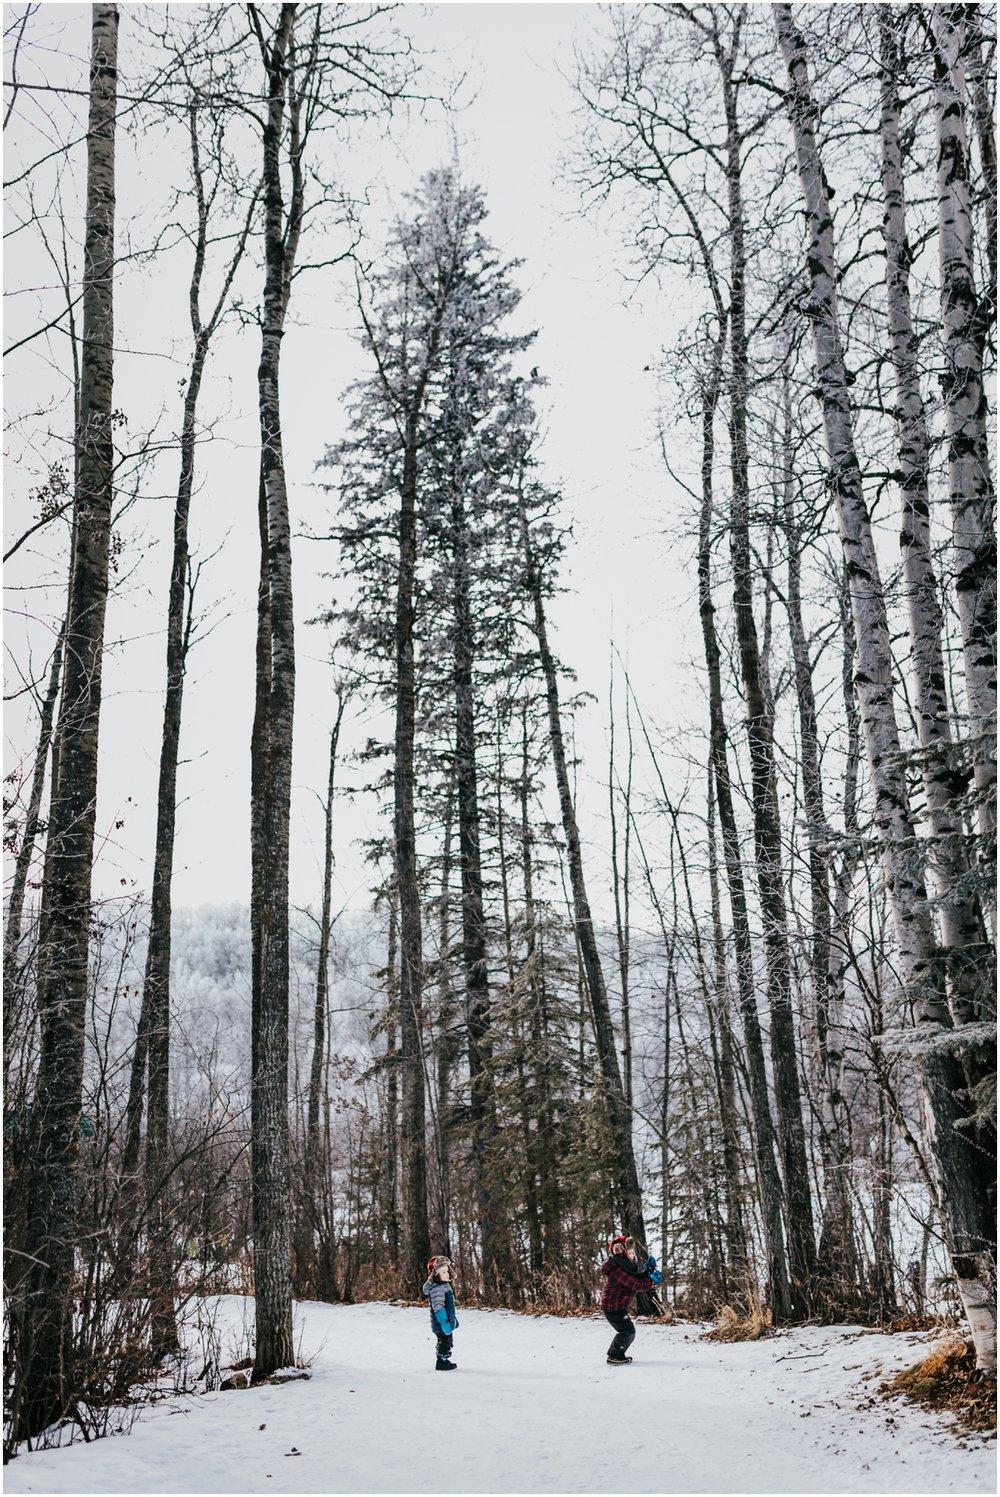 Edmonton photographer - Adventure photography Alberta - Edmonton adventure session - winter trees - Edmonton Alberta Lifestyle photographer - documentary photography